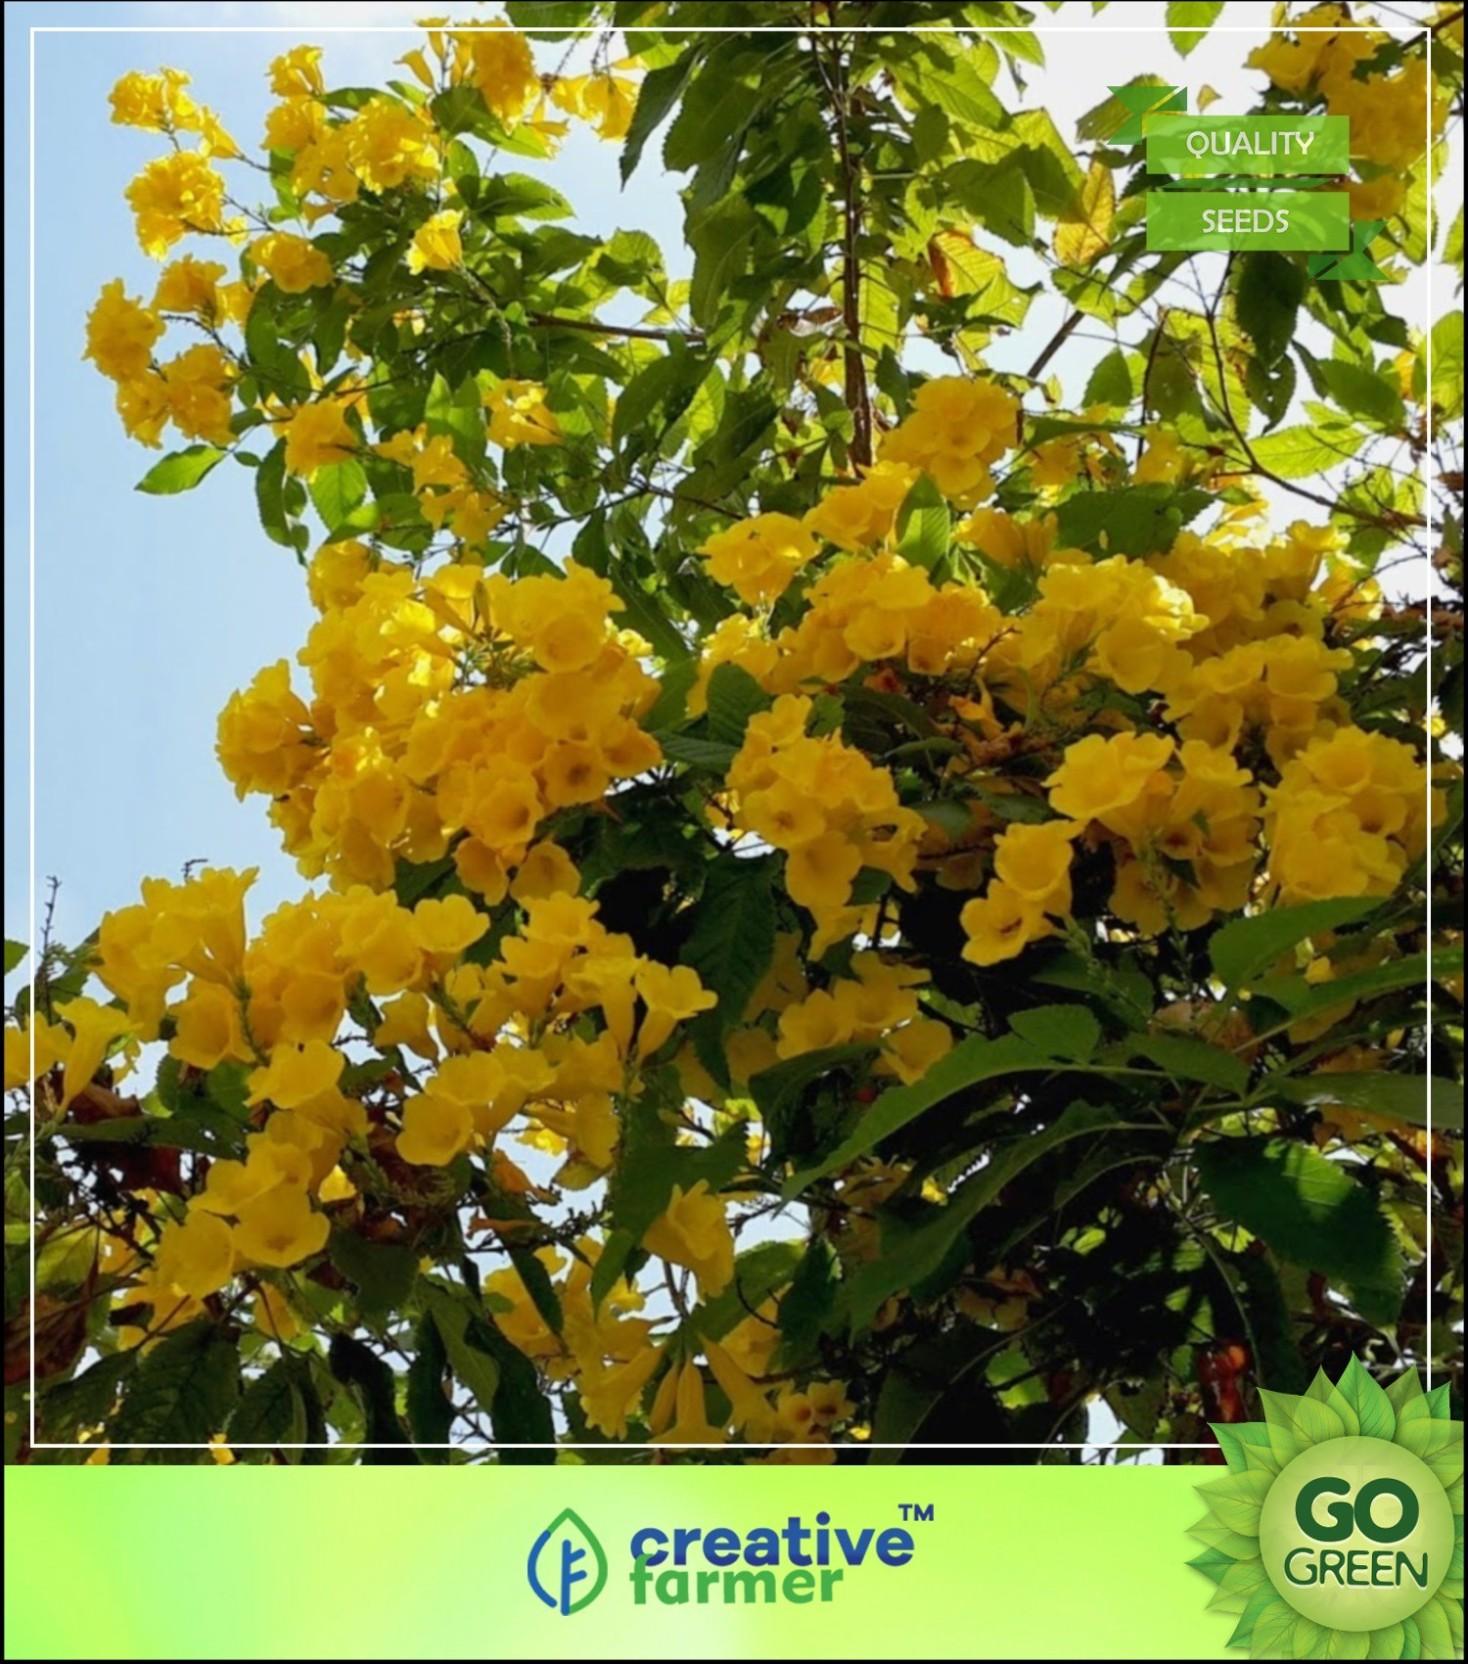 Creative Farmer Ornamental Tree Plants Stenolobium Stans Yellow